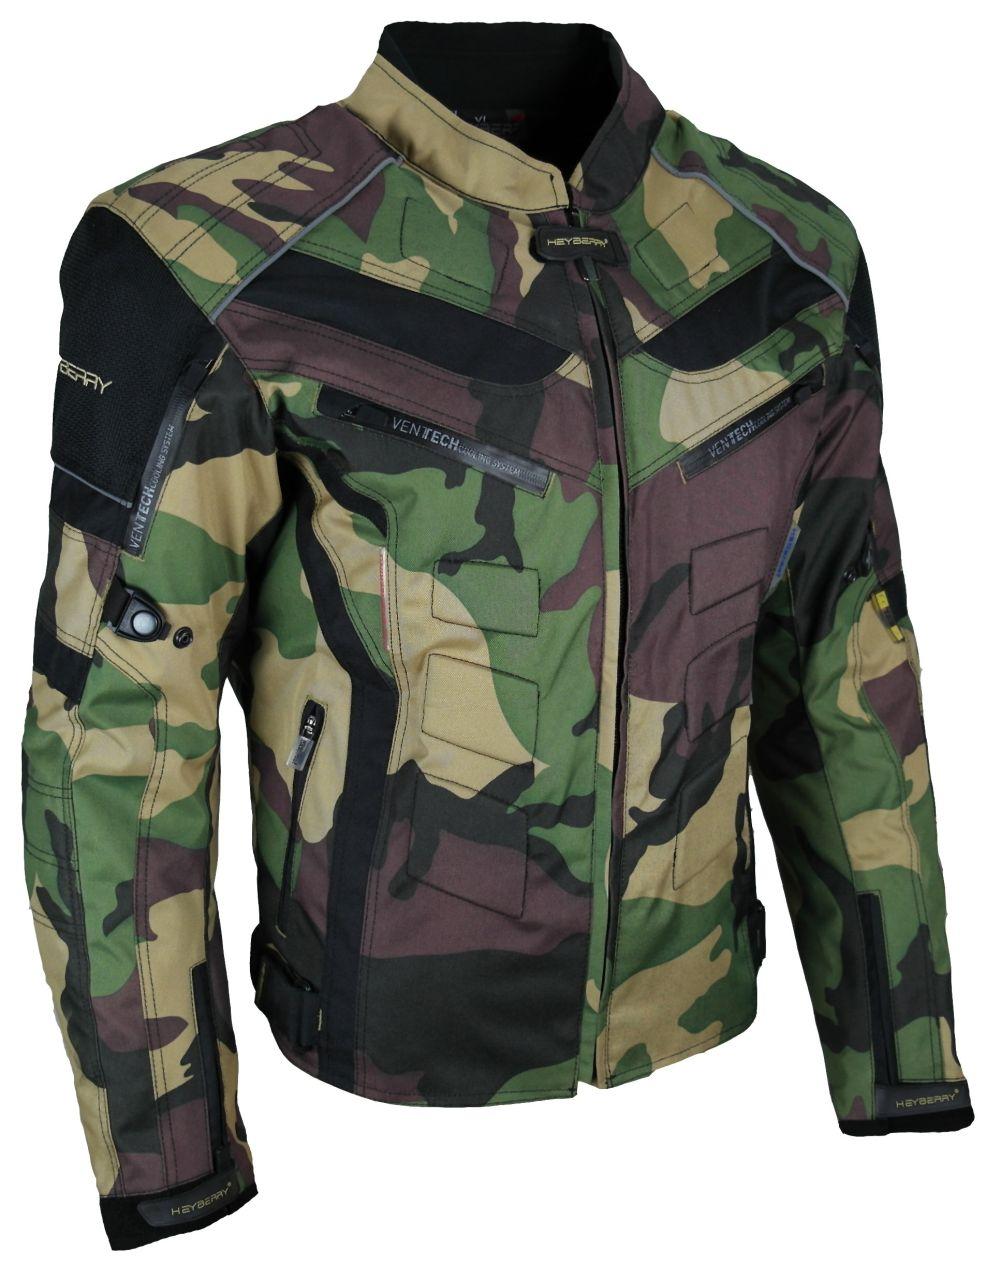 Heyberry Motorrad Roller Jacke Motorradjacke Camouflage Woodland Gr. M bis 7XL